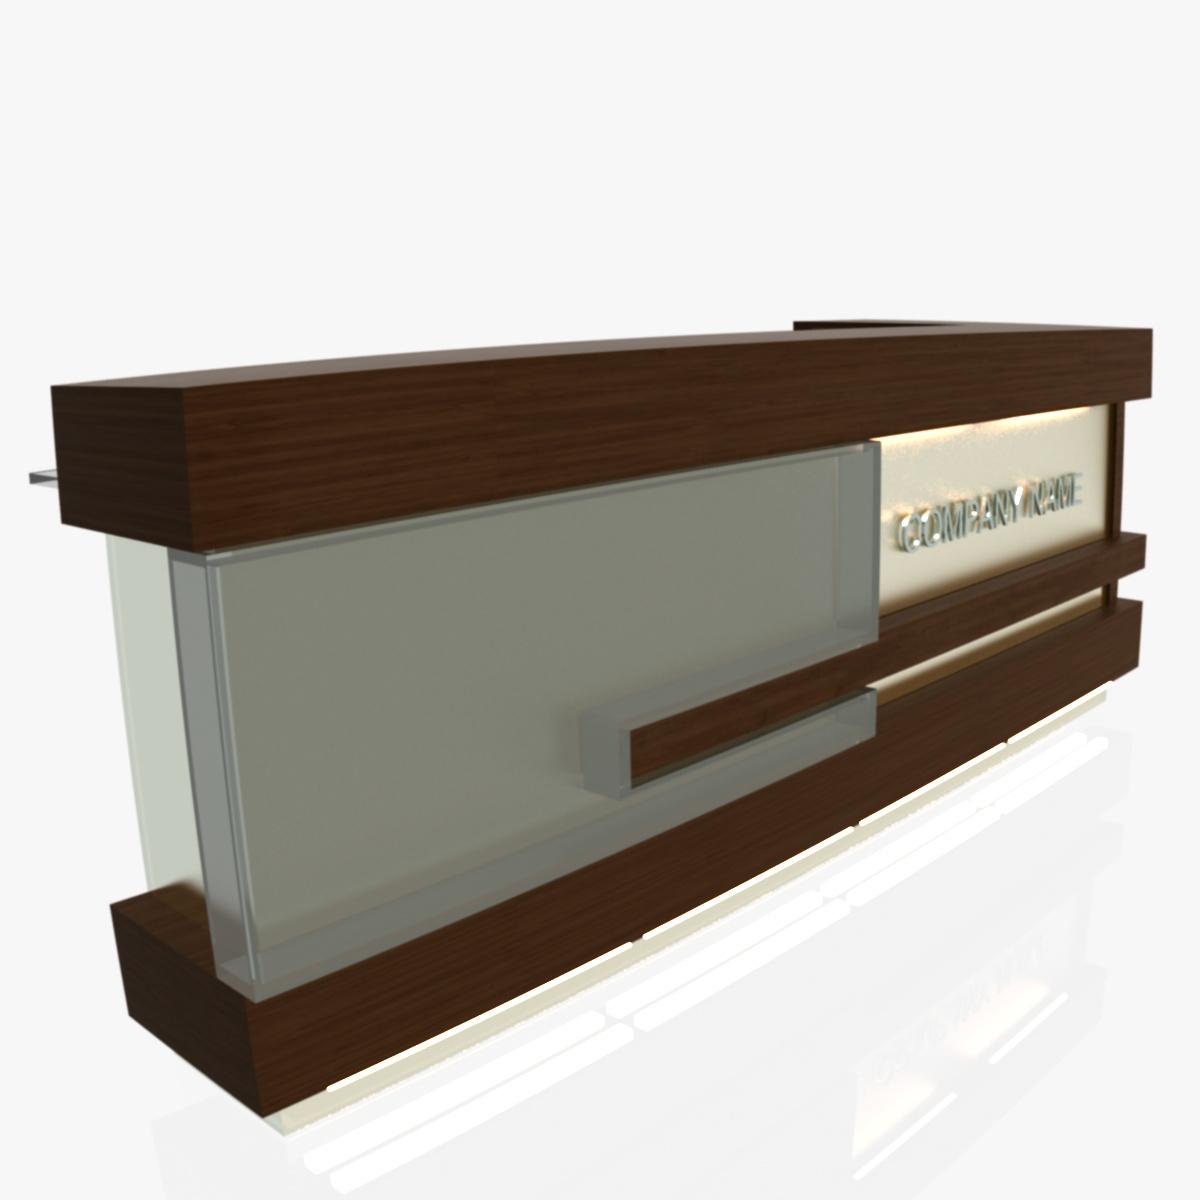 reception desk 1 3d model 3ds max dxf fbx  obj 219851